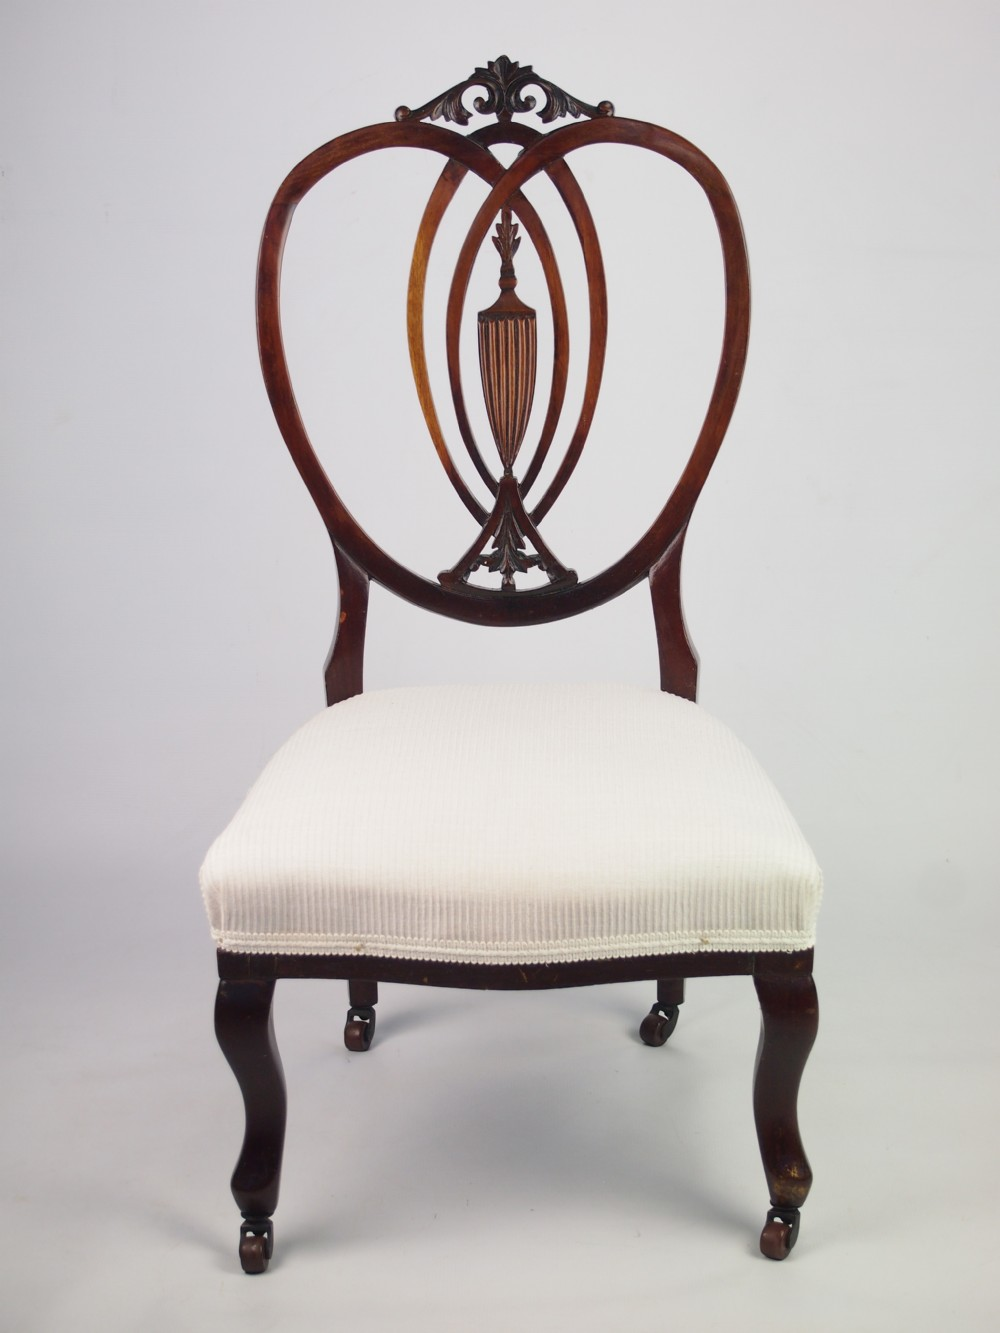 Superb Antique Edwardian Nursing Chair